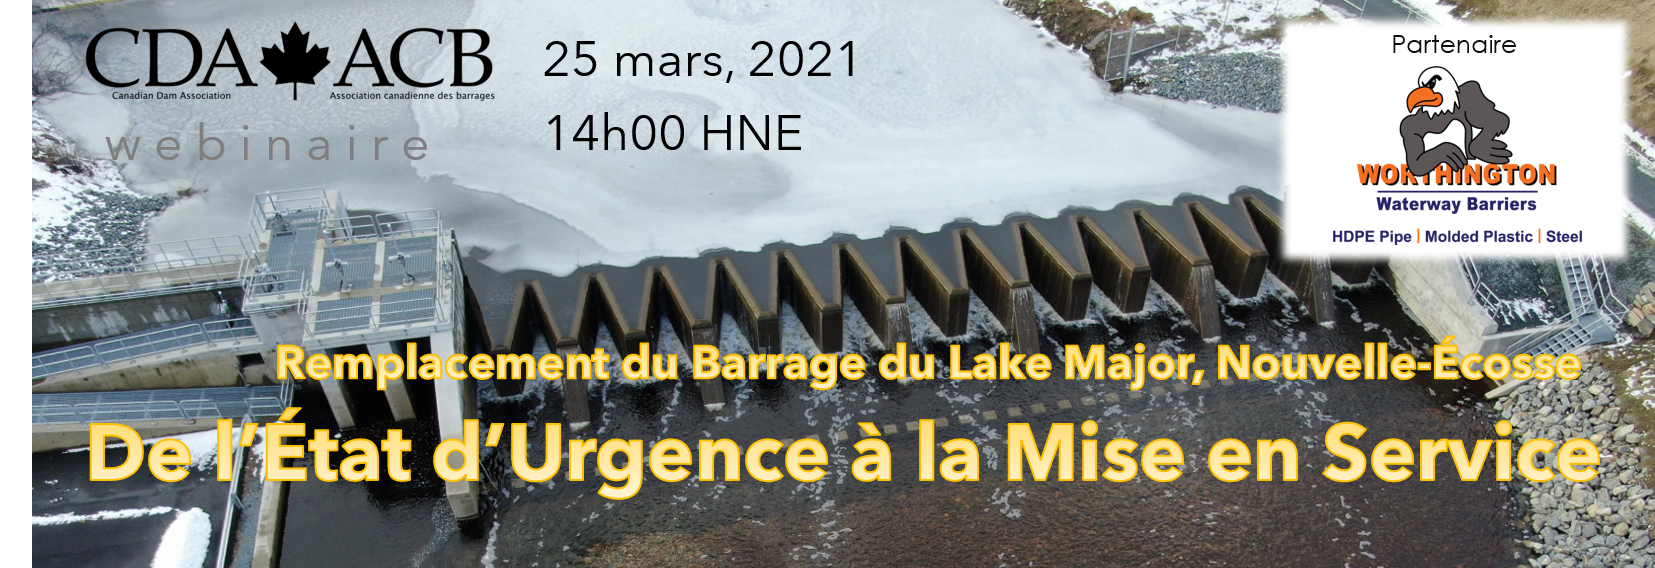 Major Dam FR 2021